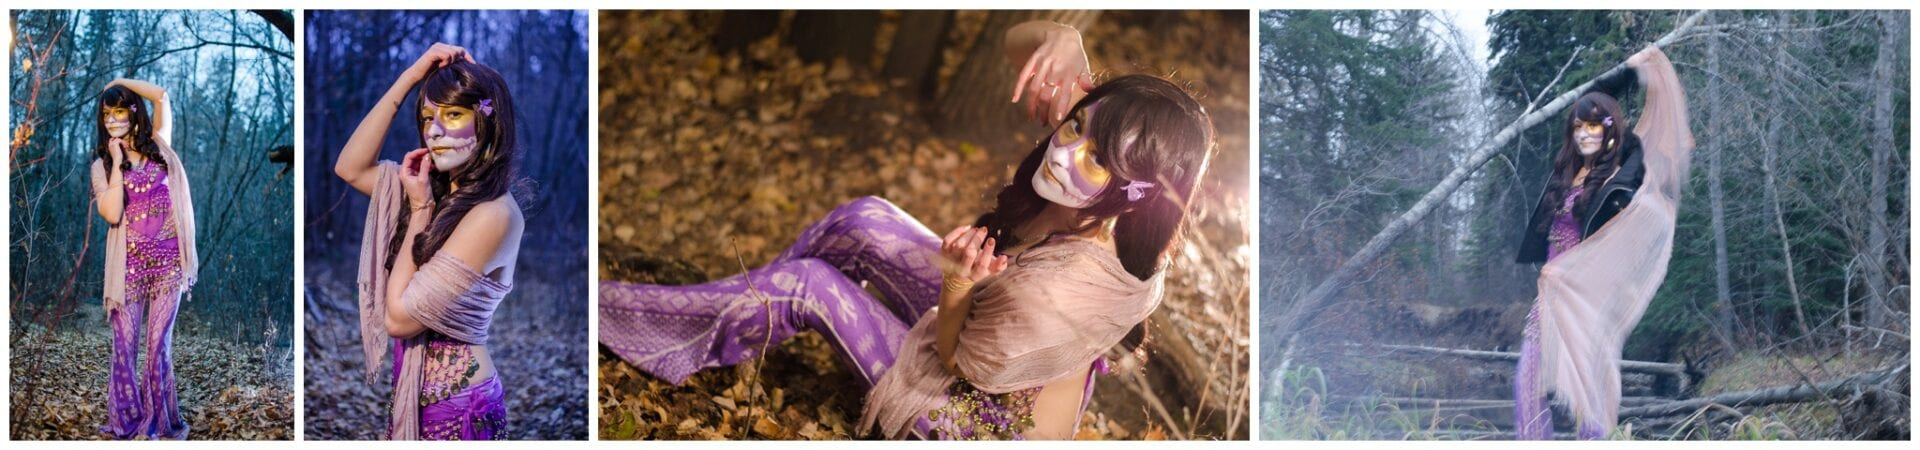 Fall-Woods-errie-fashion001